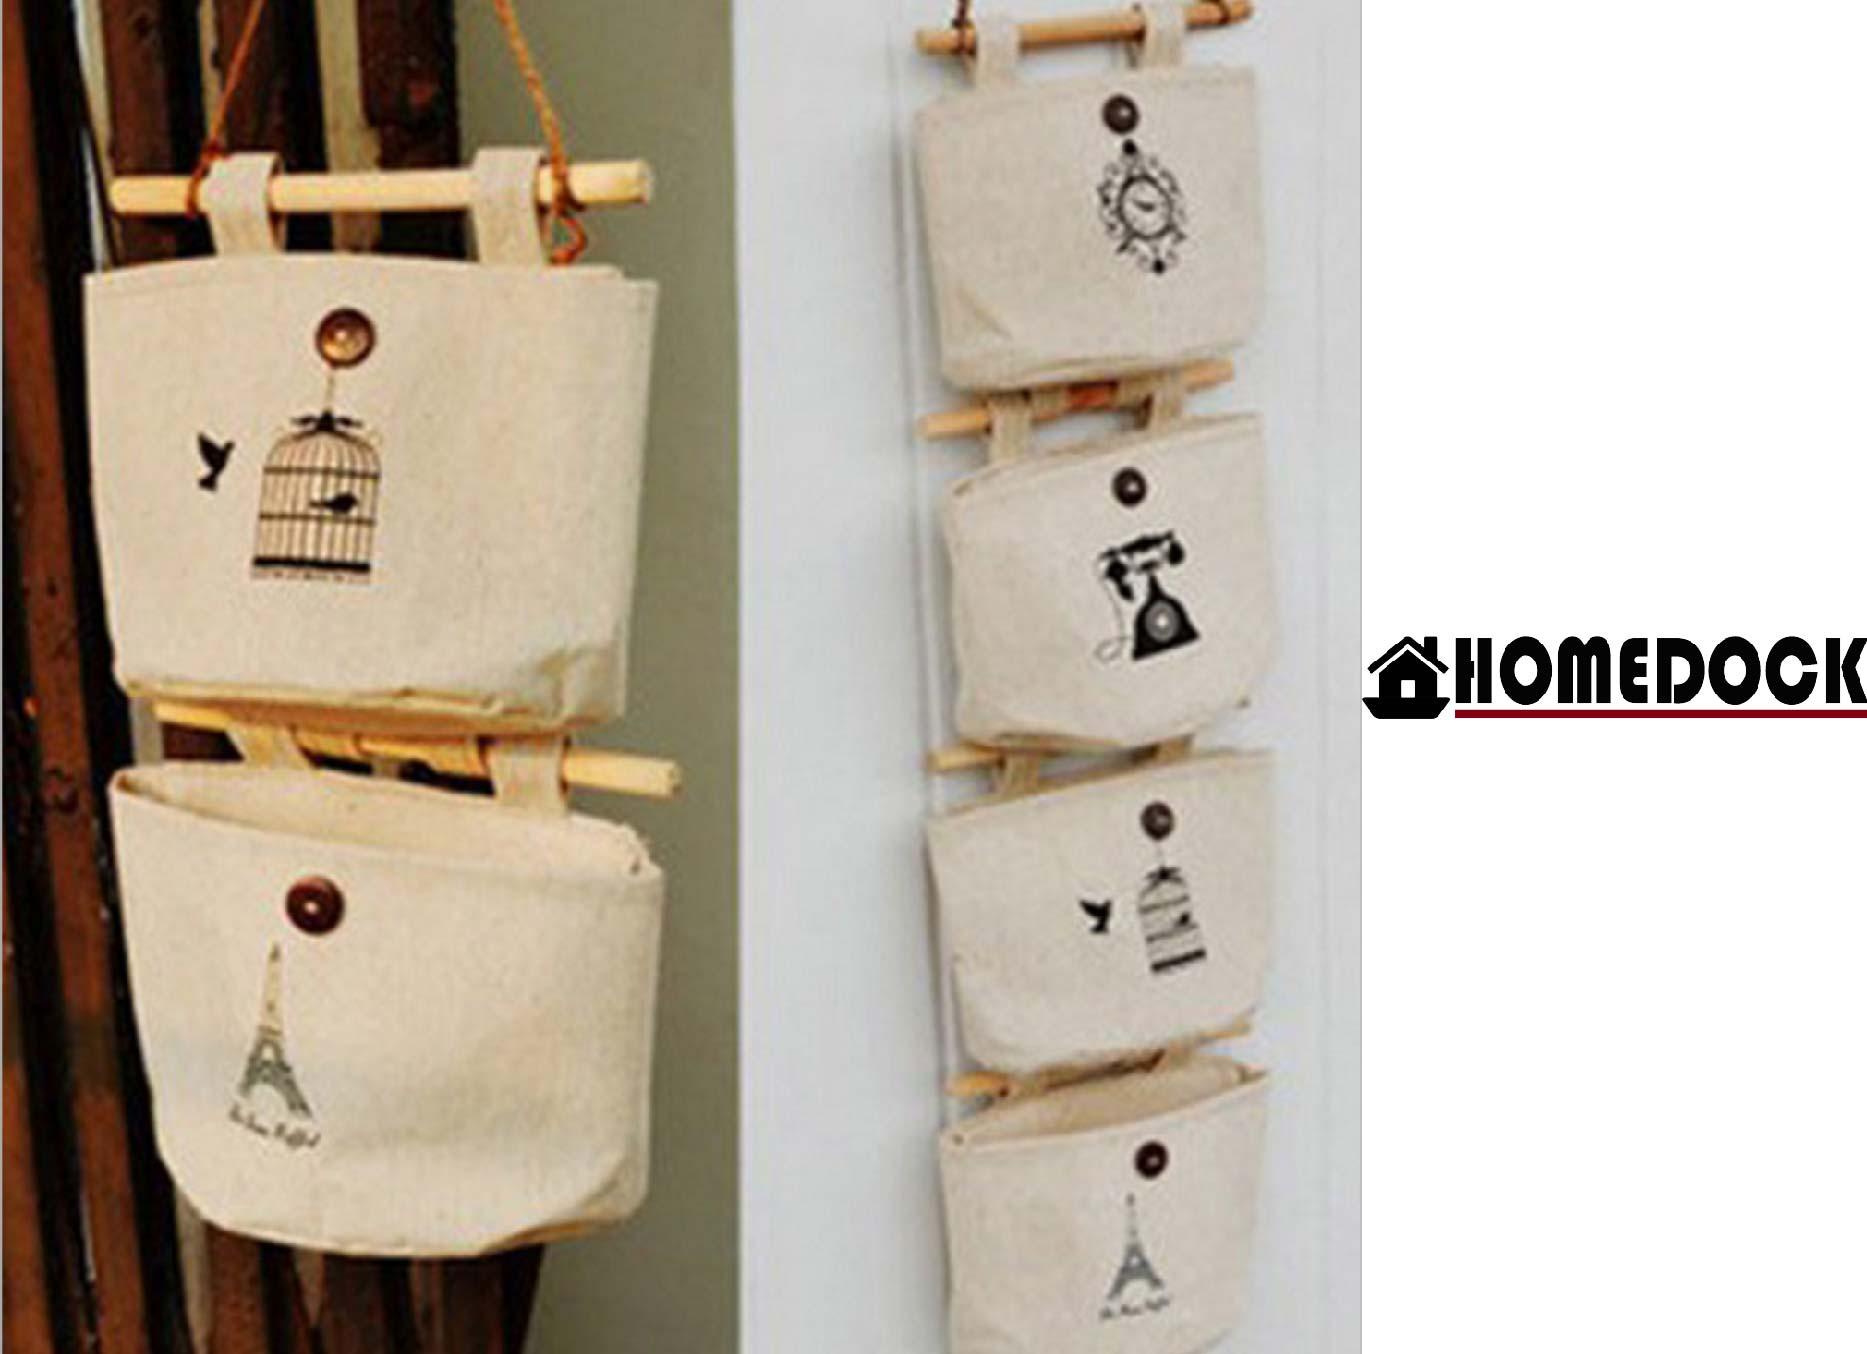 HOMEDOCK-zakka 牆壁收納掛袋 收納袋/吊帶/牆壁/掛鉤/鄉村/收納包/整理